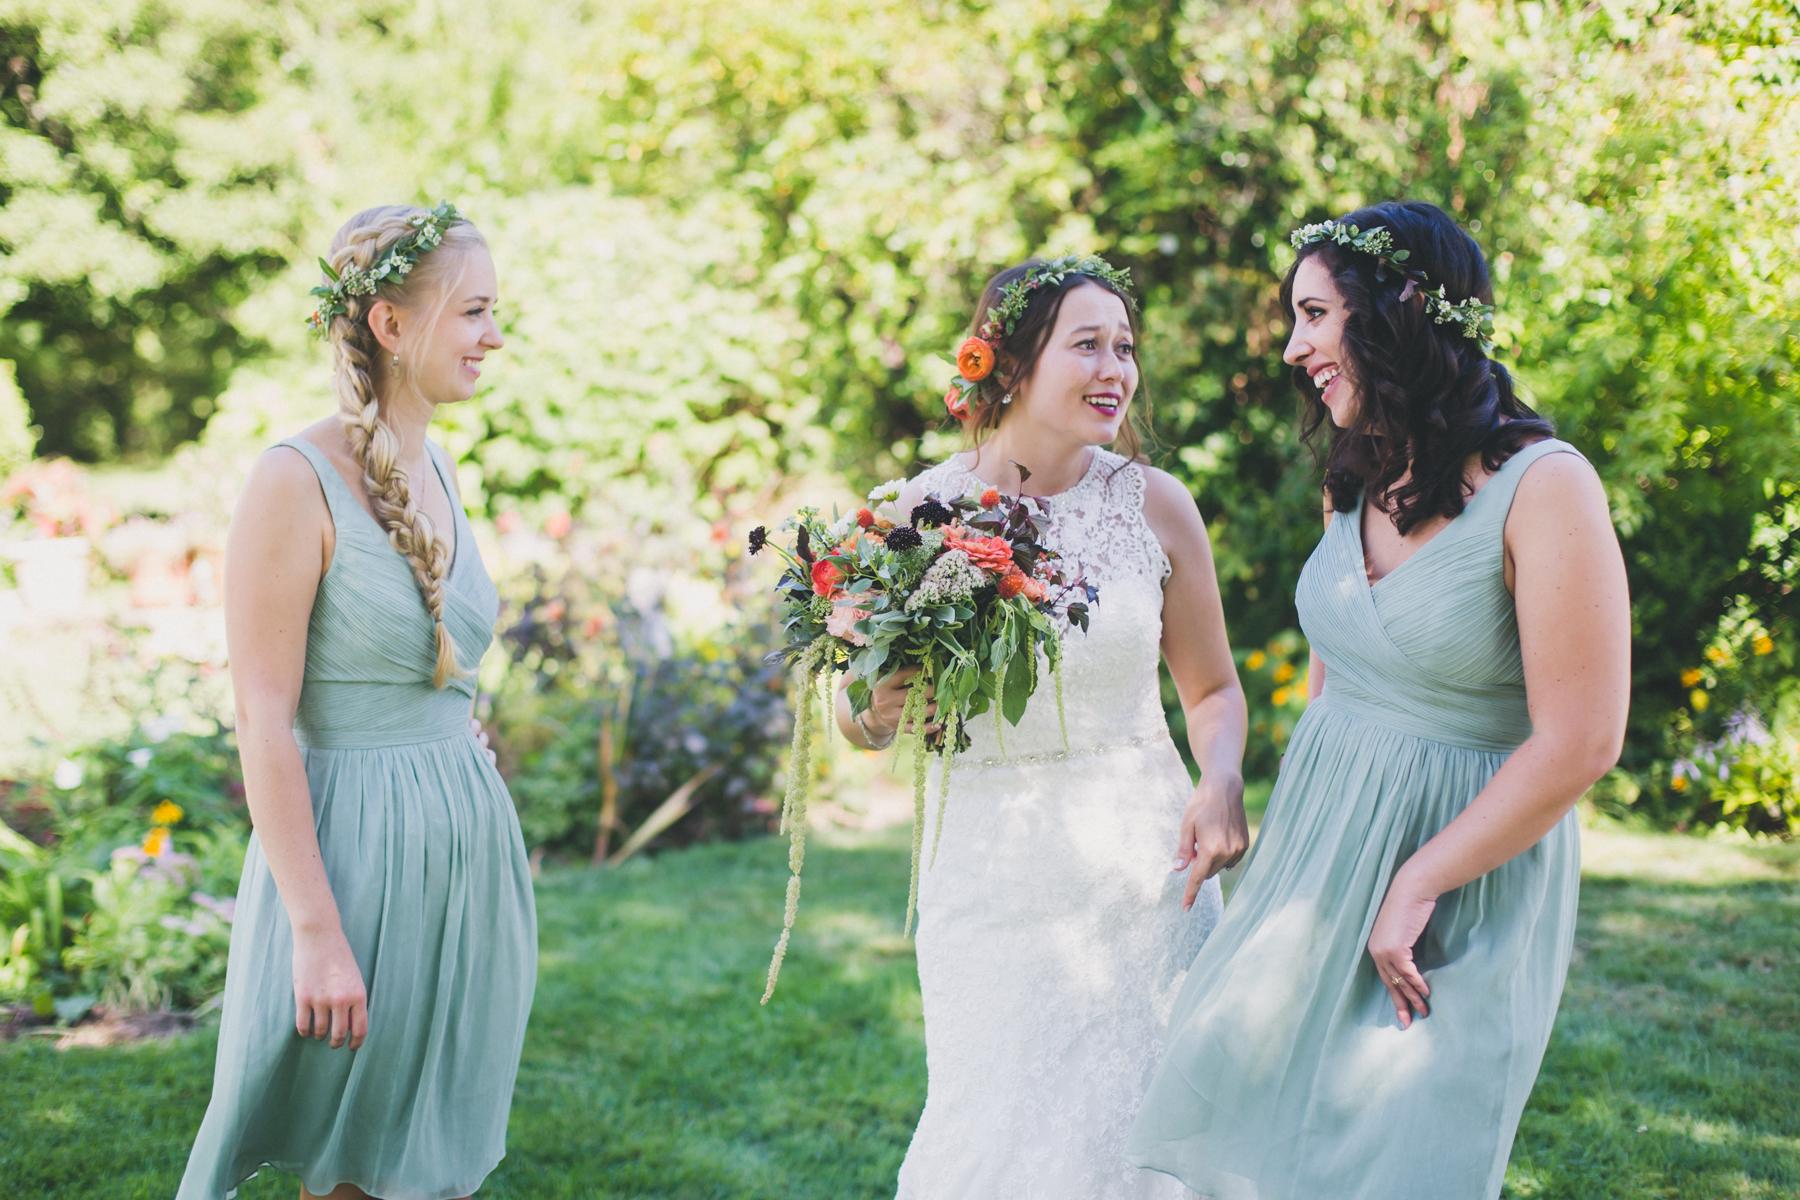 Long-Island-Documentary-Wedding-Photography-Summer-Tent-Wedding-in-New-York-41.jpg